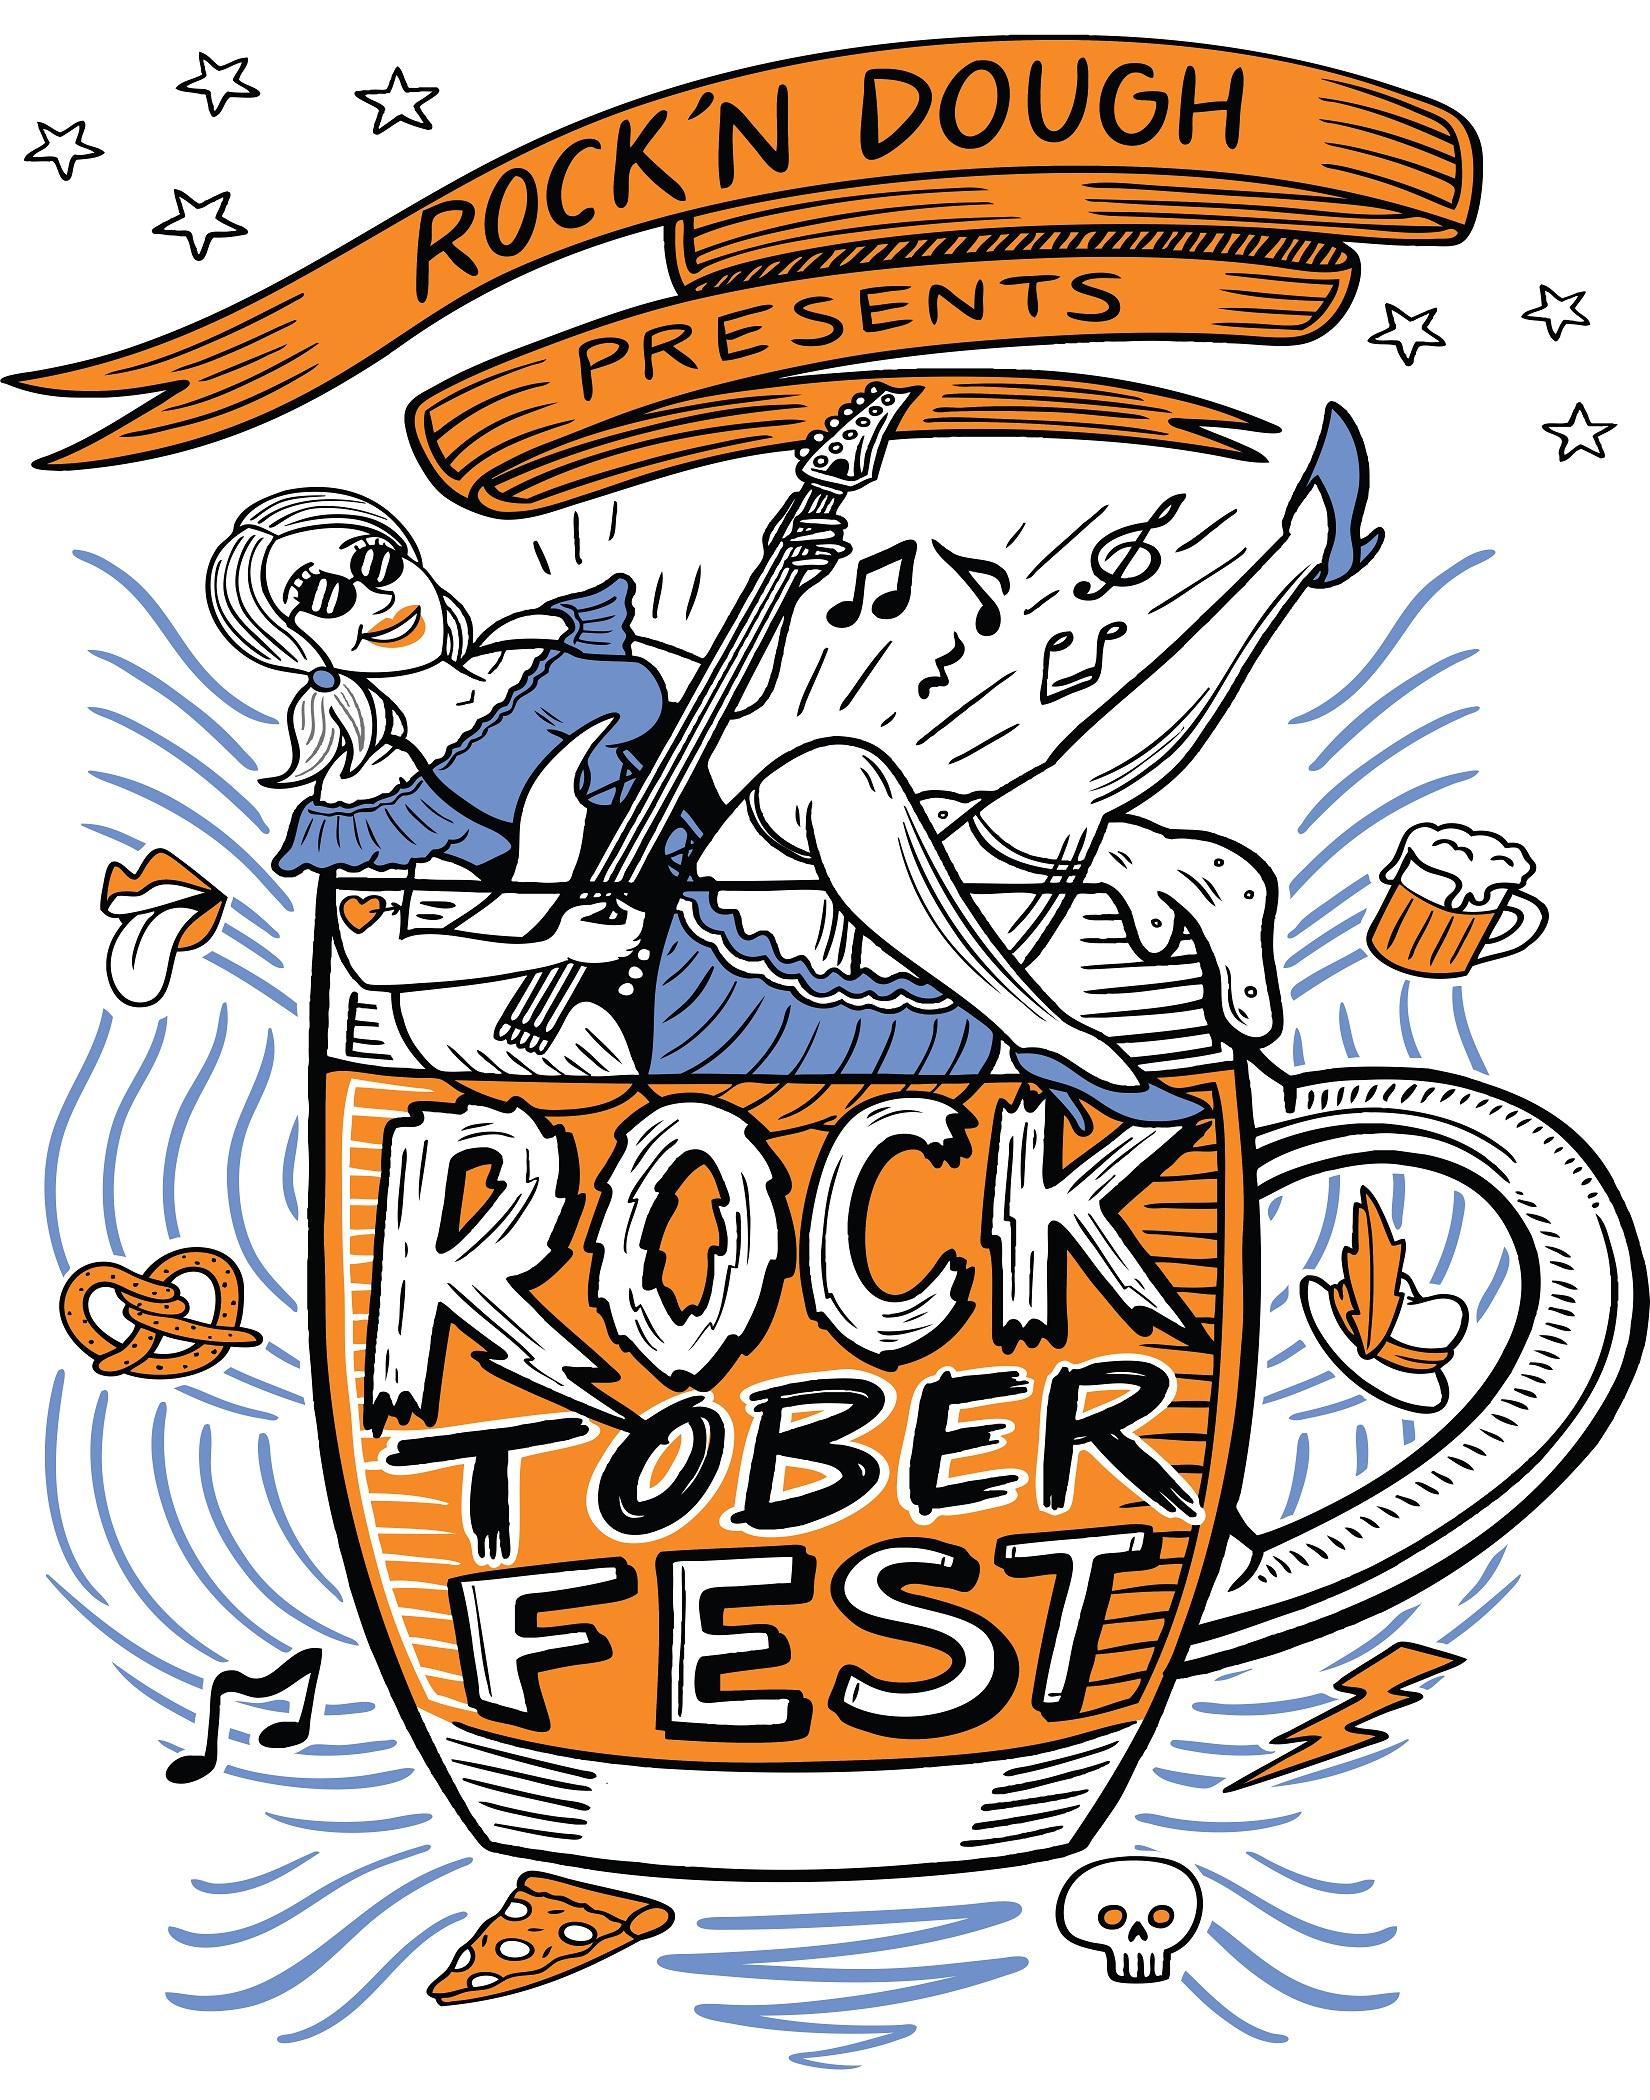 Rocktoberfest.jpg